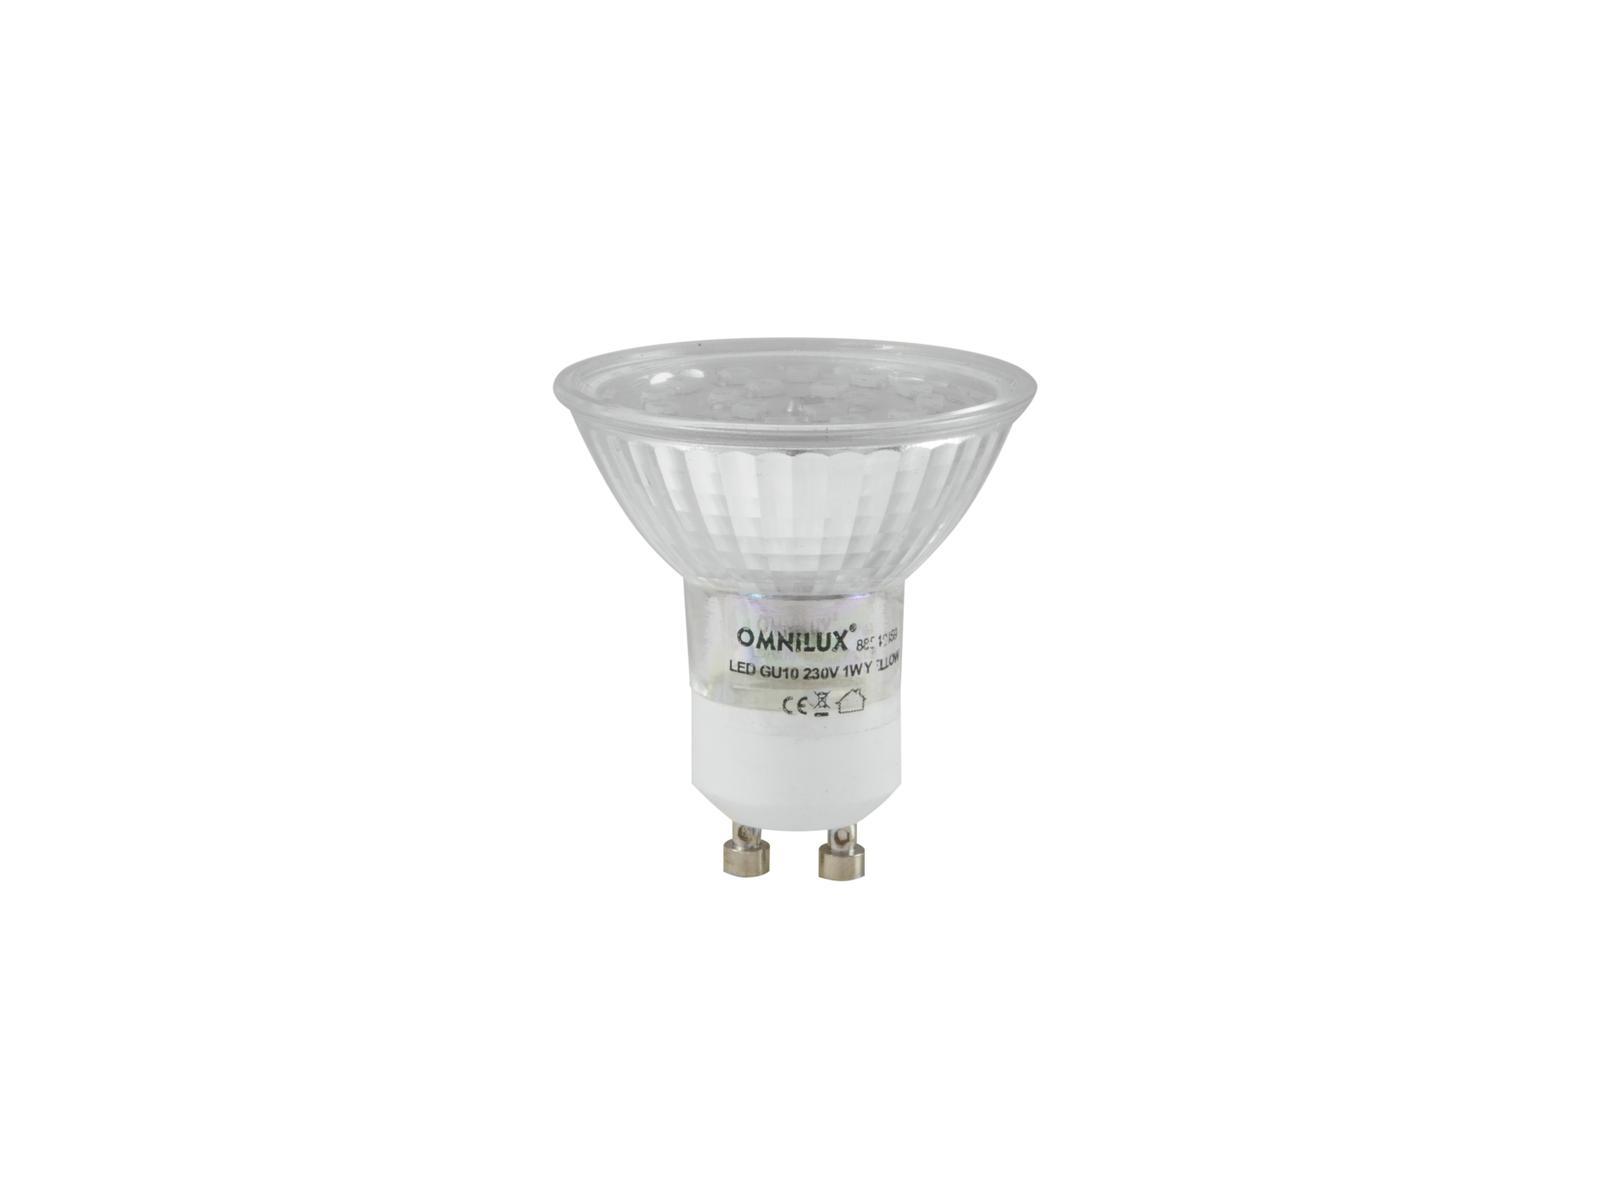 Lampada a led UV attiva GU-10 230V 18